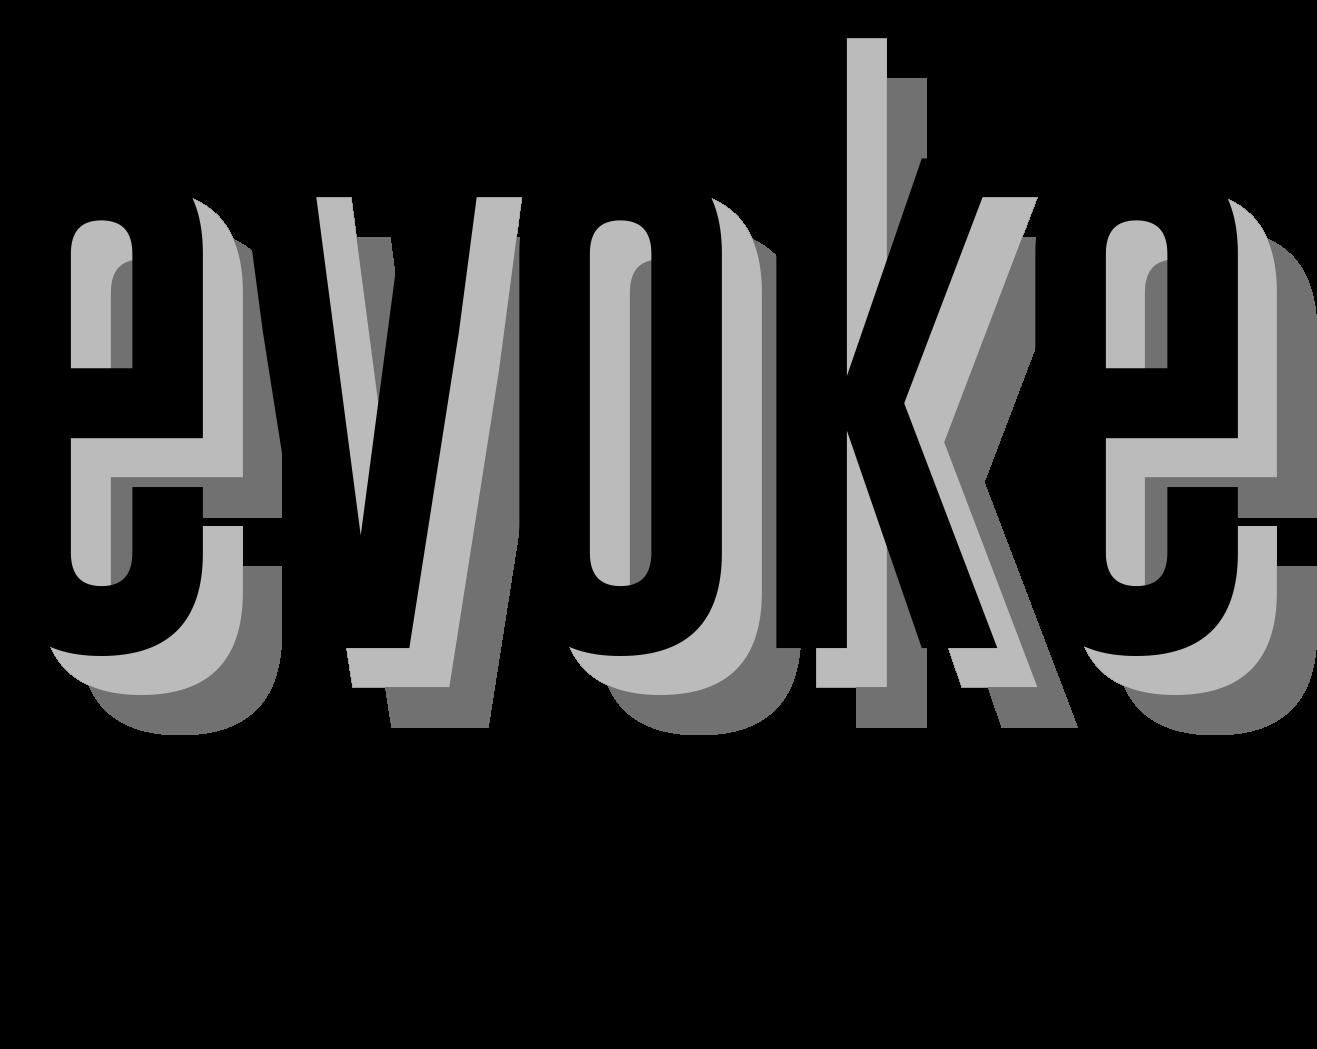 Evoke_Horizonal_Black_Alpha_1300x1050.png